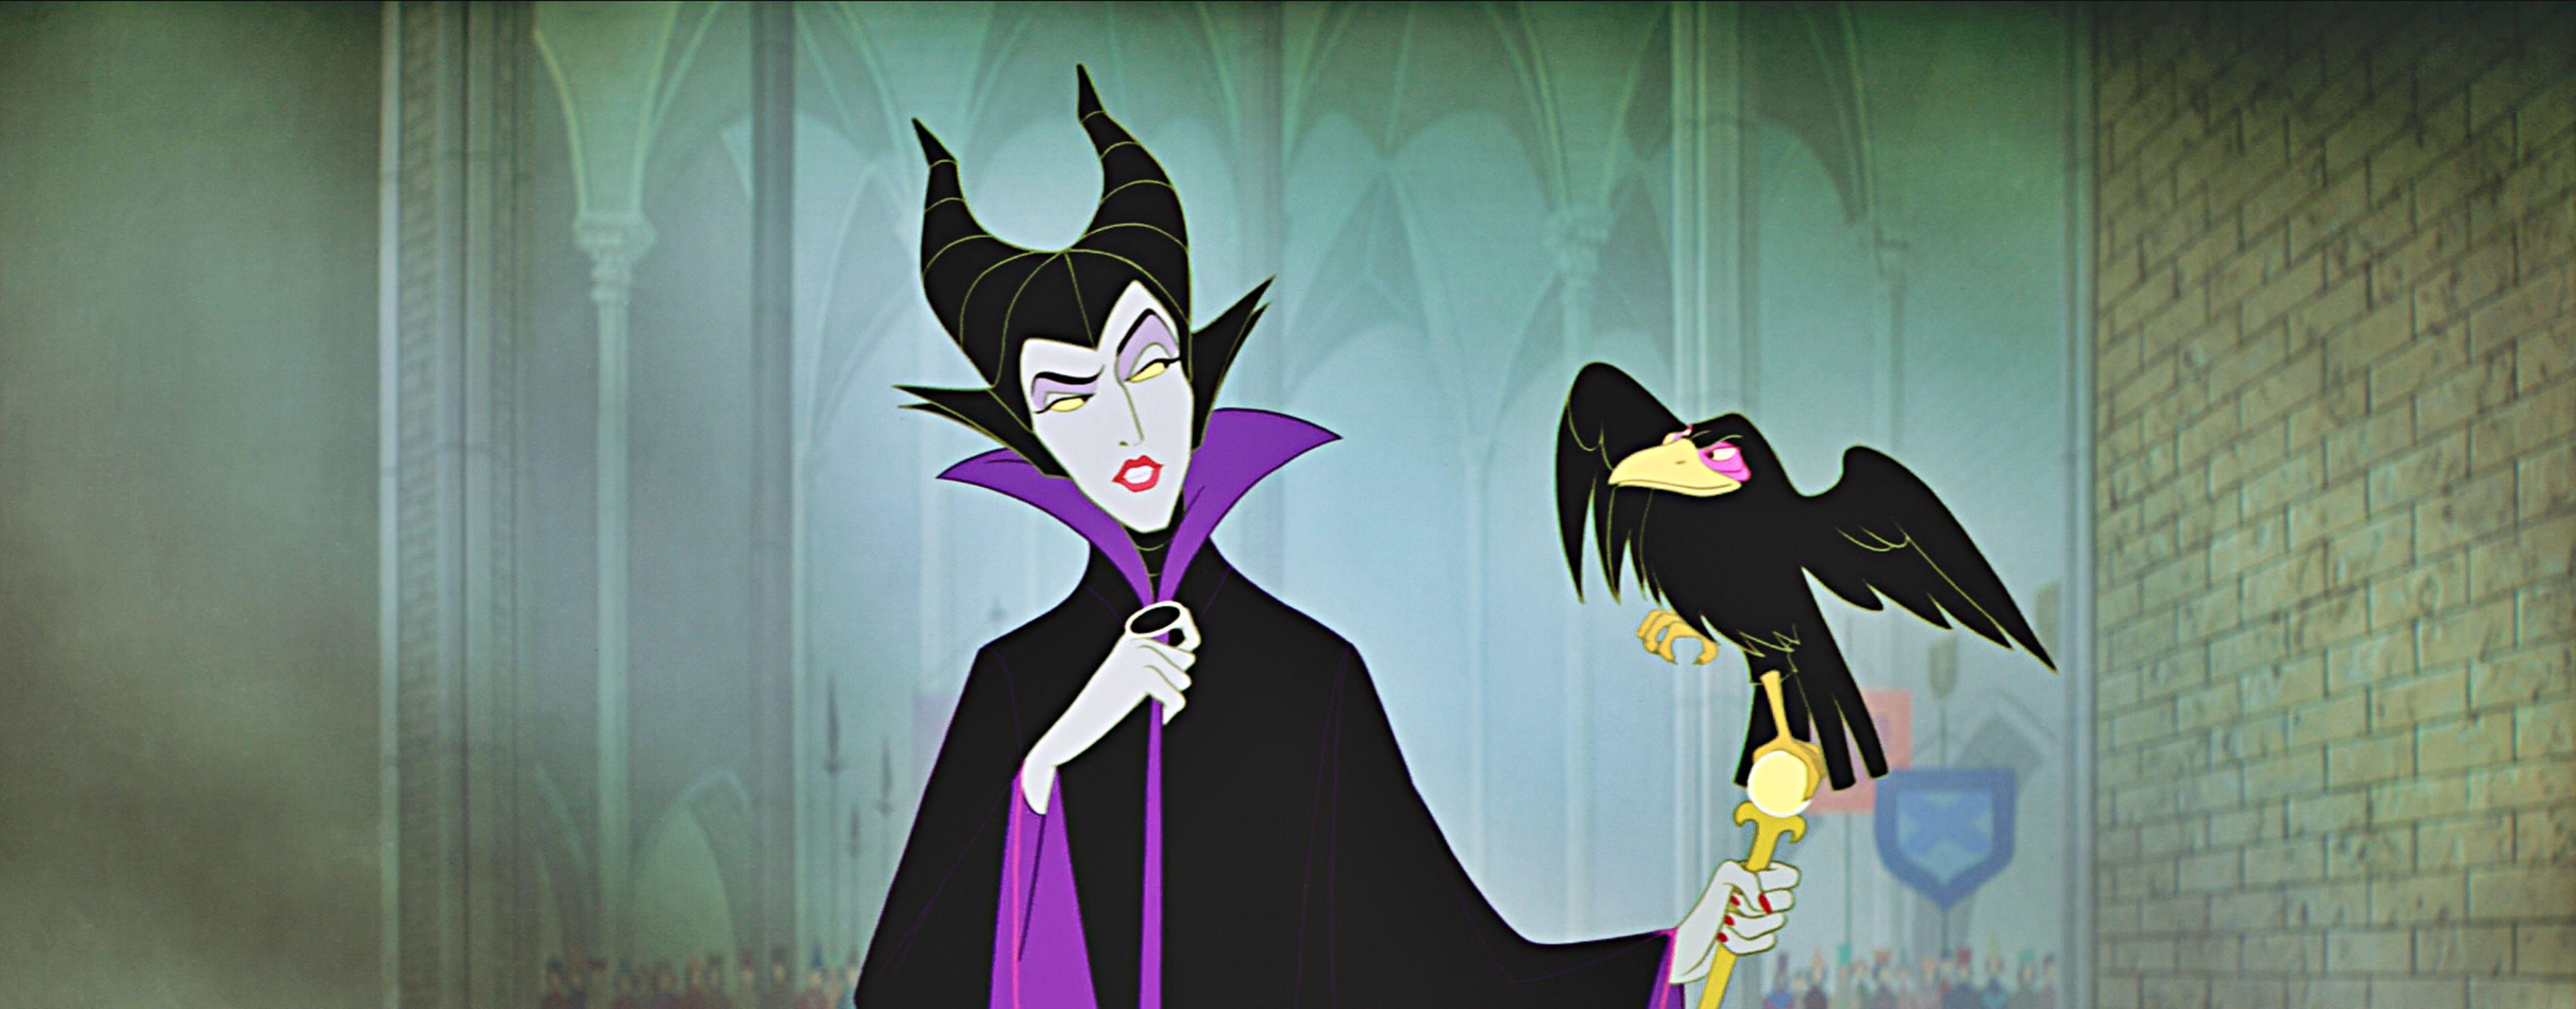 maleficent character | Walt Disney Screencaps - Maleficent